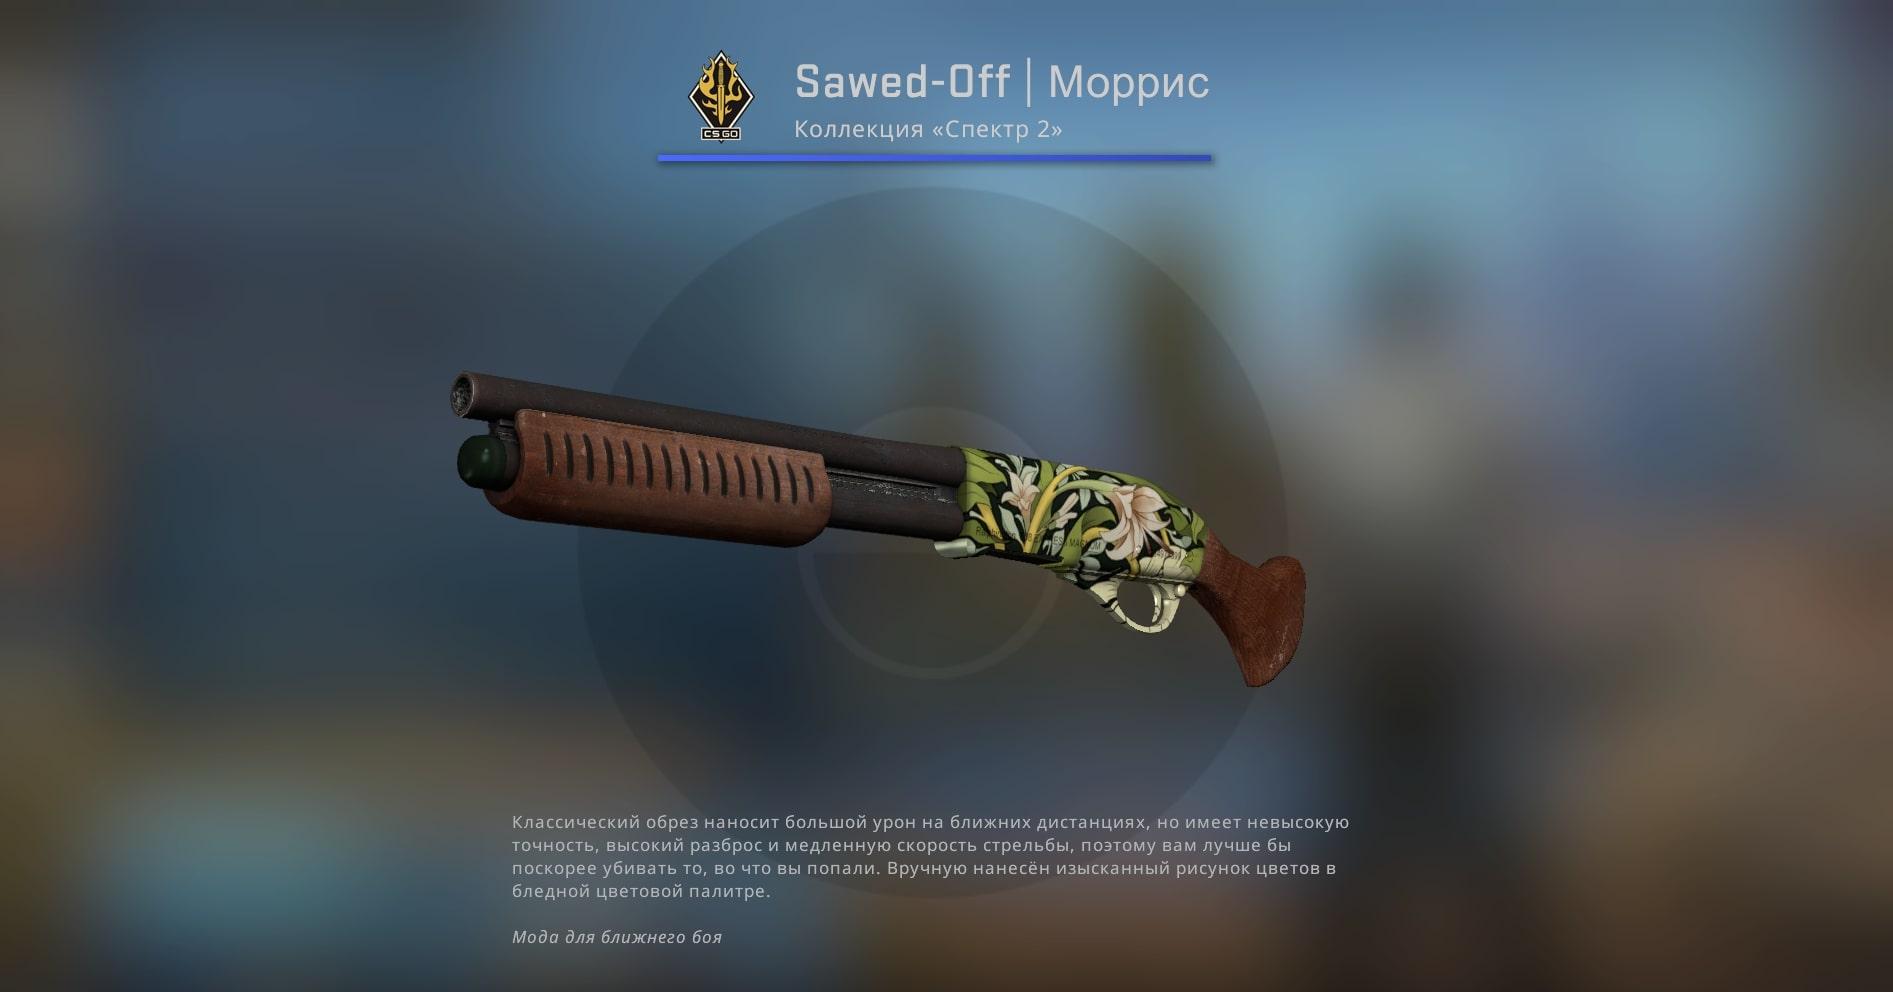 Sawed-Off Моррис